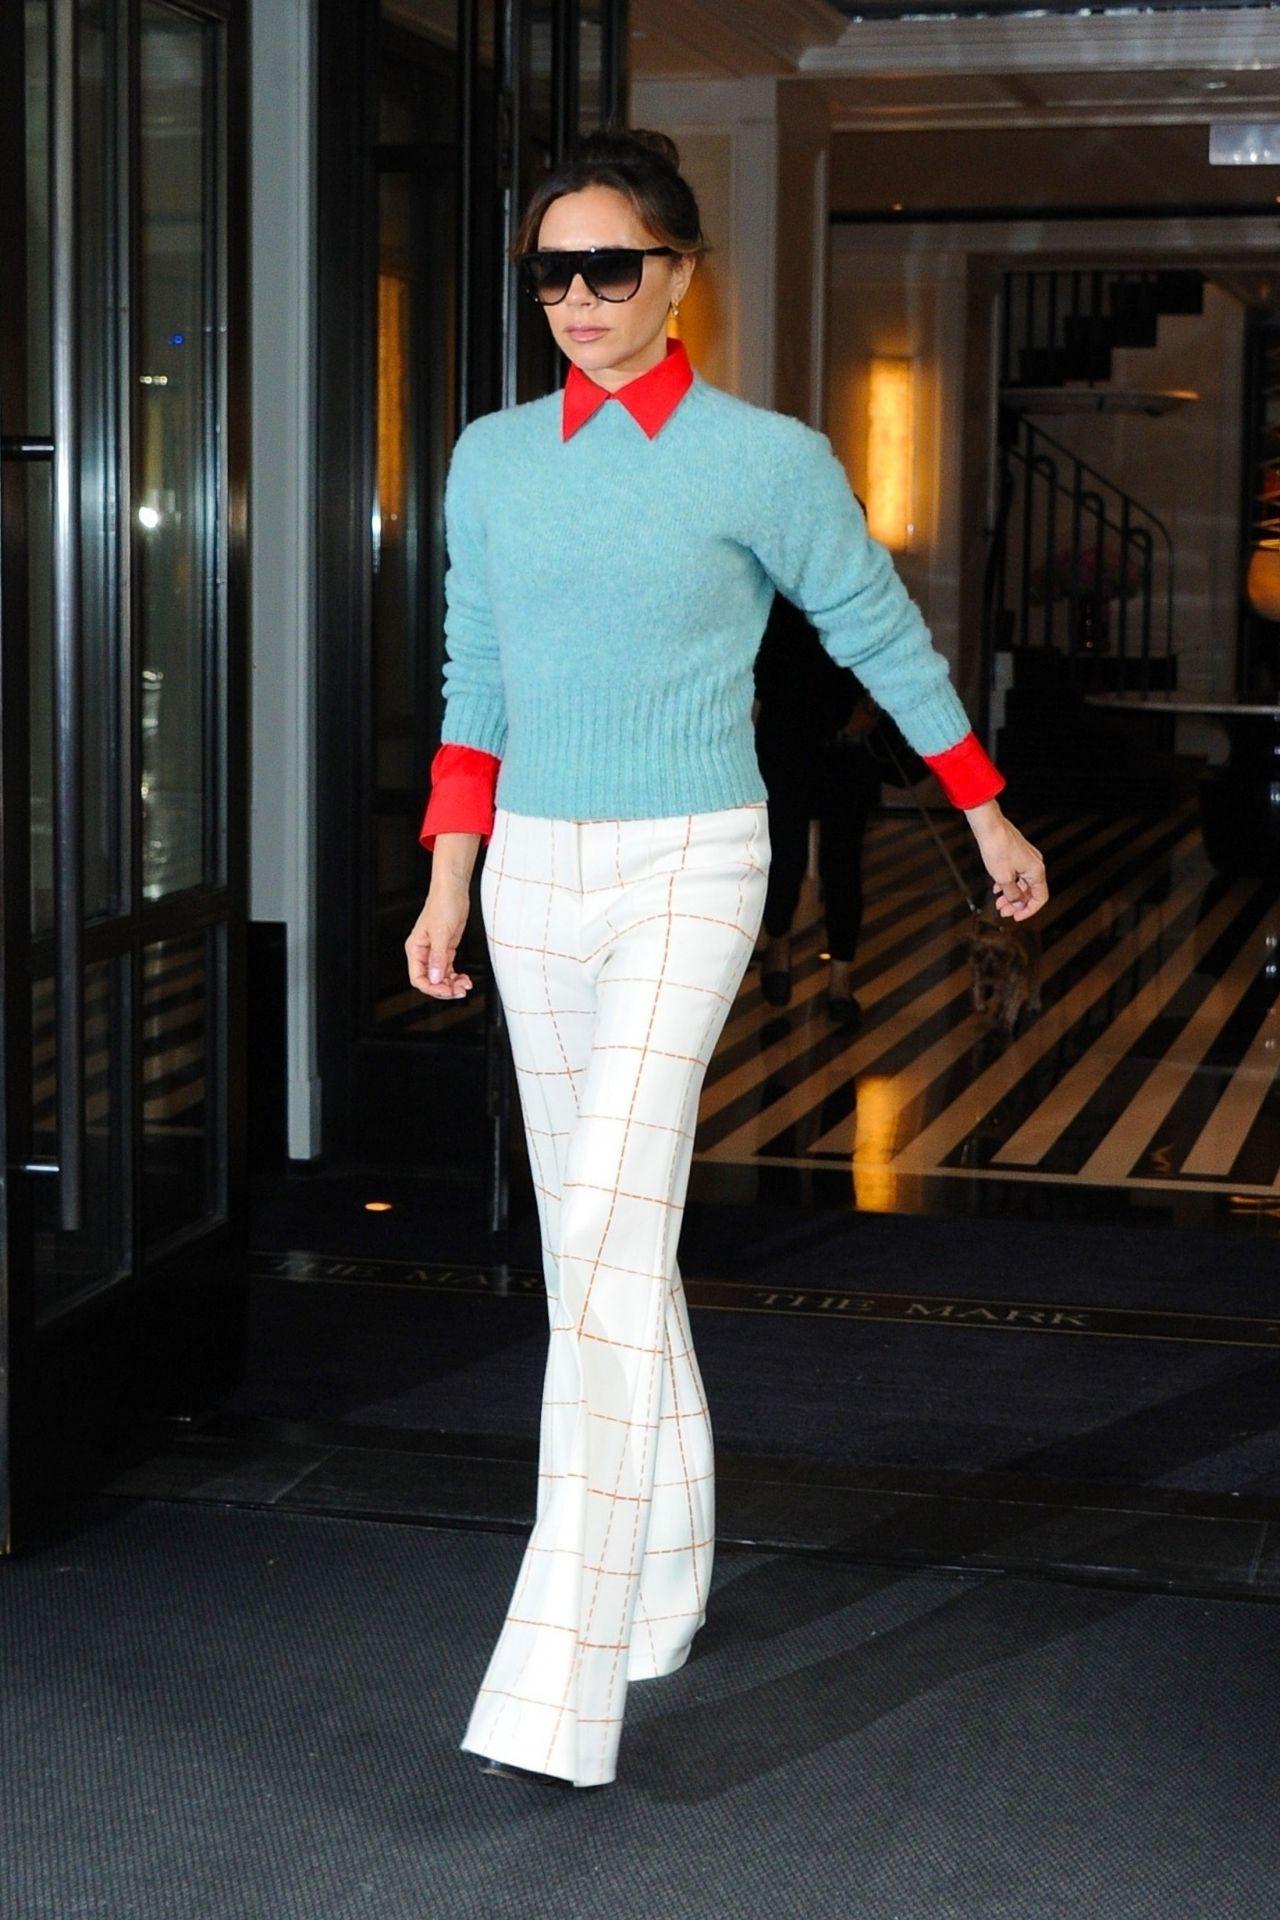 Victoria Beckham Style and Fashion  New York 05102019